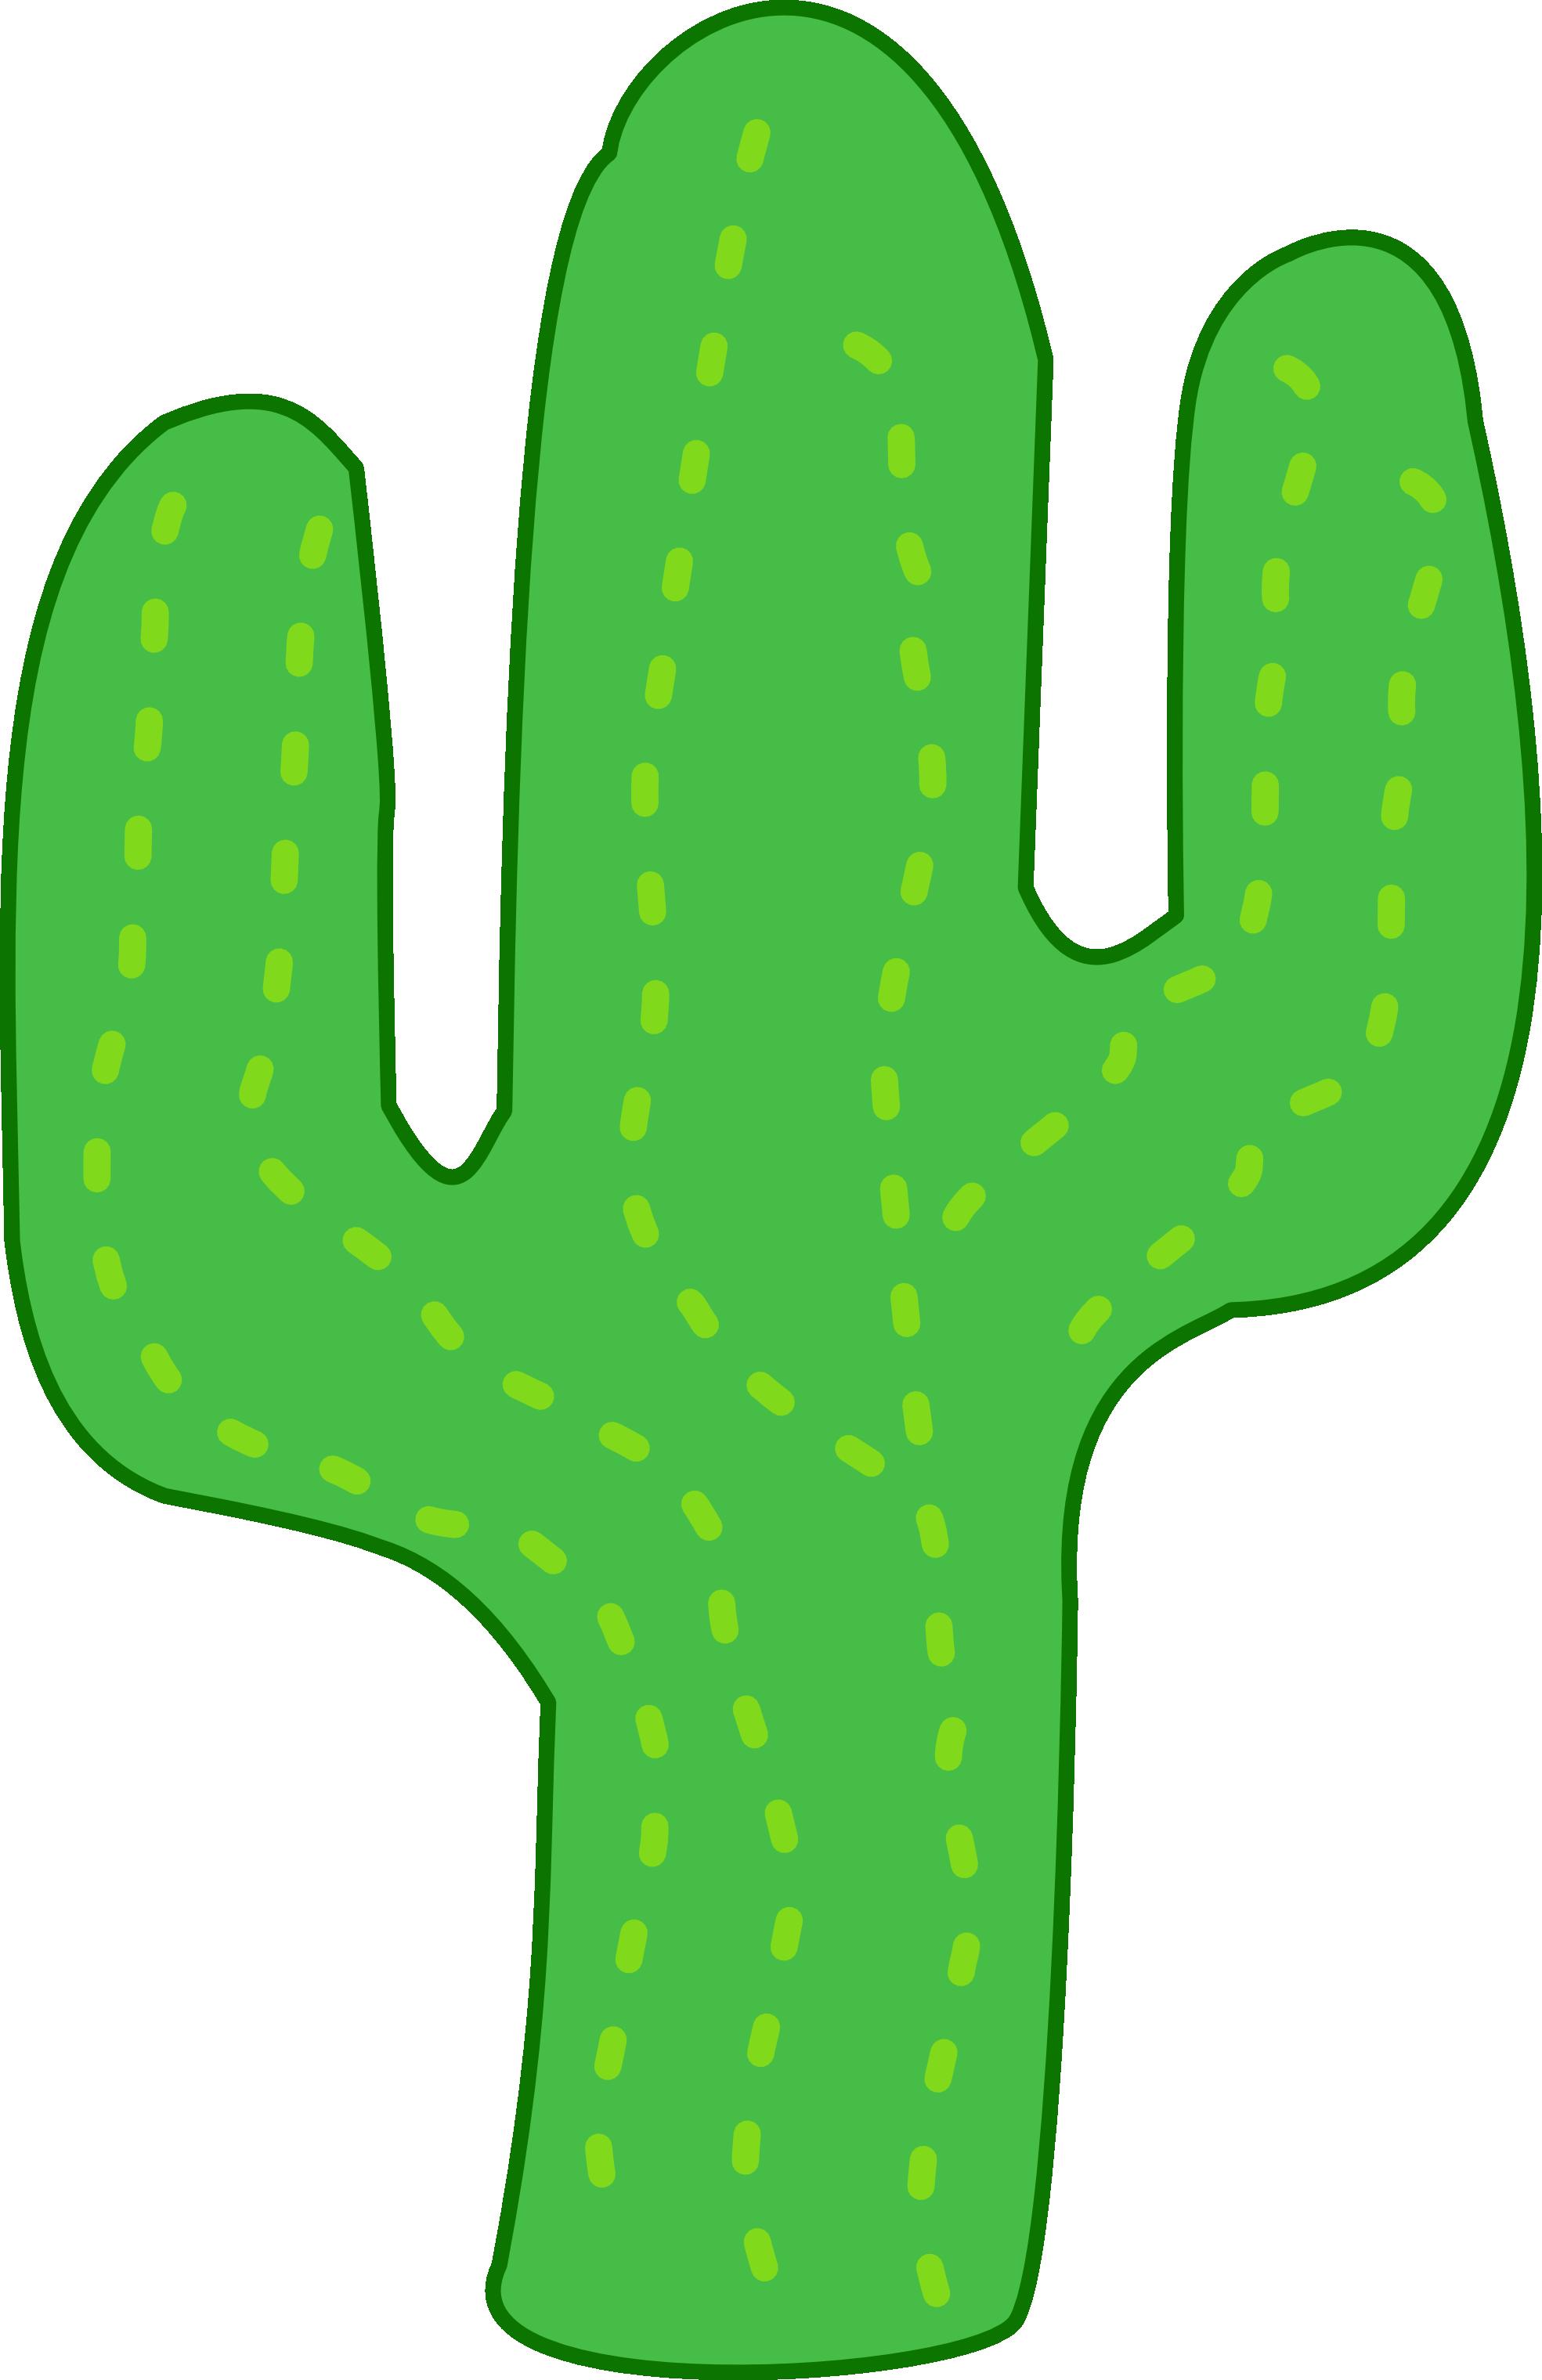 cactus clipart clipart panda free clipart images rh clipartpanda com cactus clip art colored cactus clip art black and white